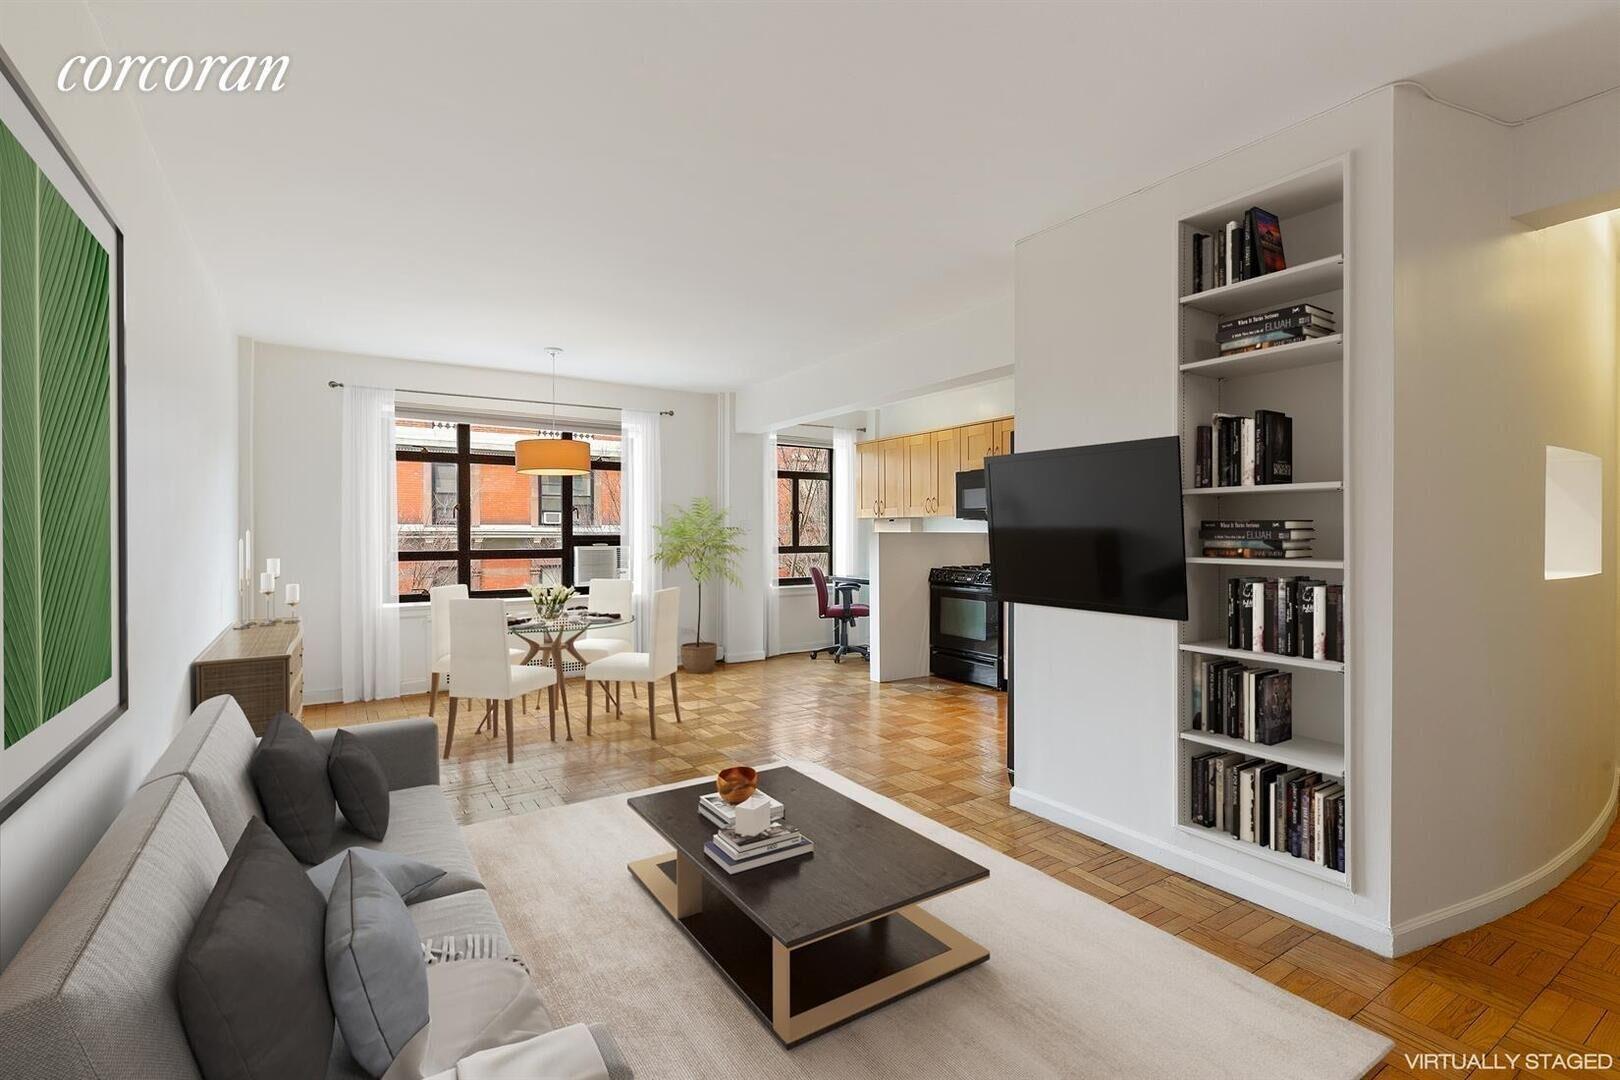 Apartment for sale at 100 Remsen Street, Apt 4J